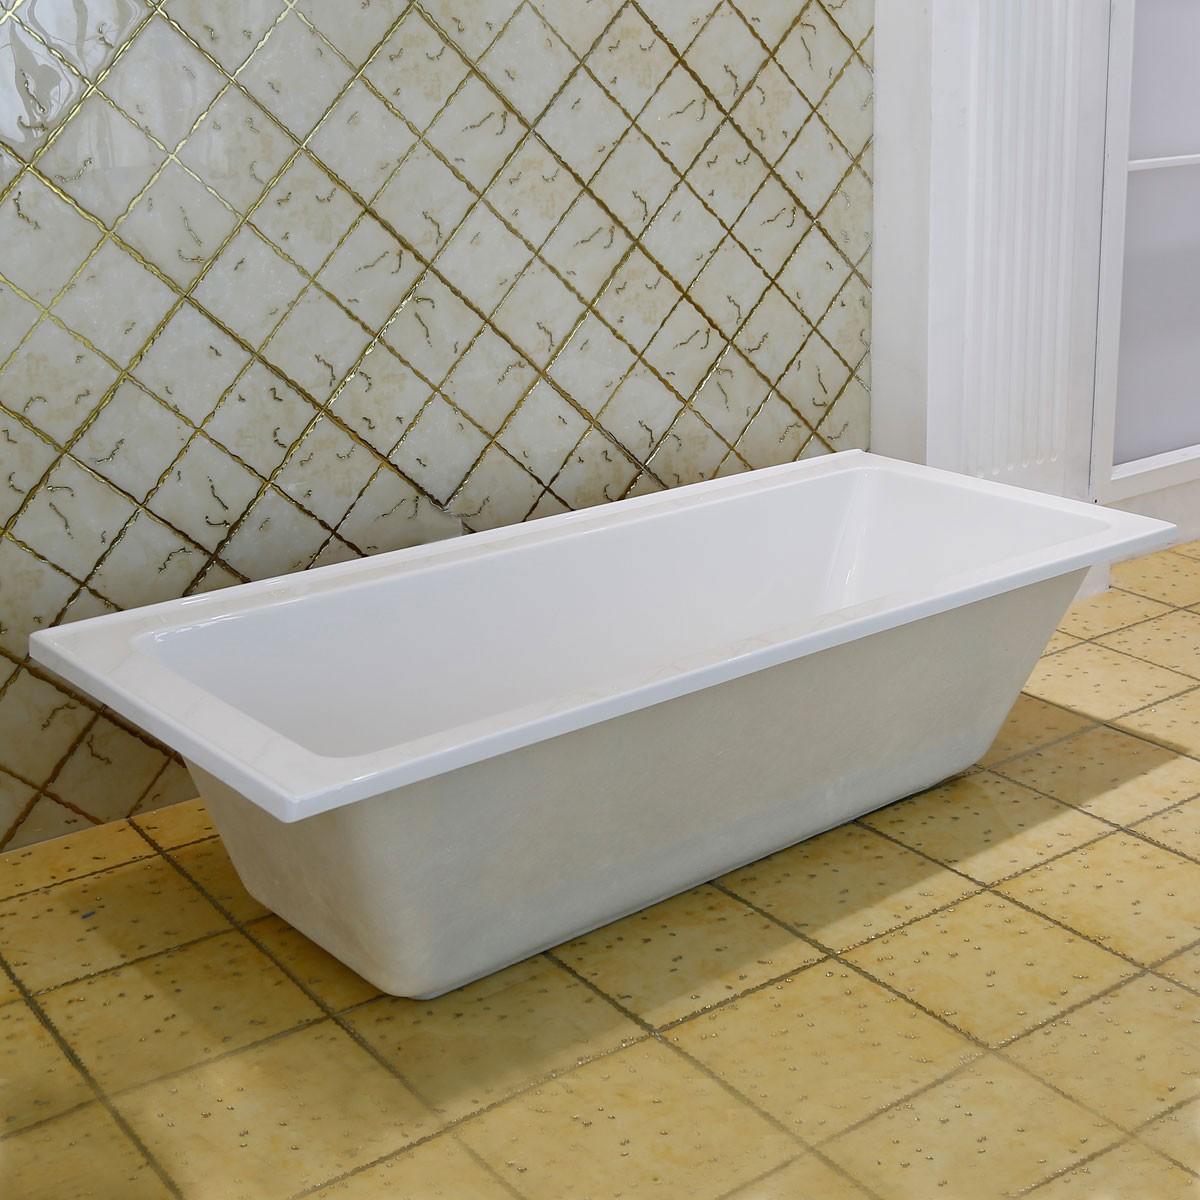 65 po baignoire encastrable blanche en acrylique de salle de bain dk 2002 1650l et Baignoire acrylique salle bains